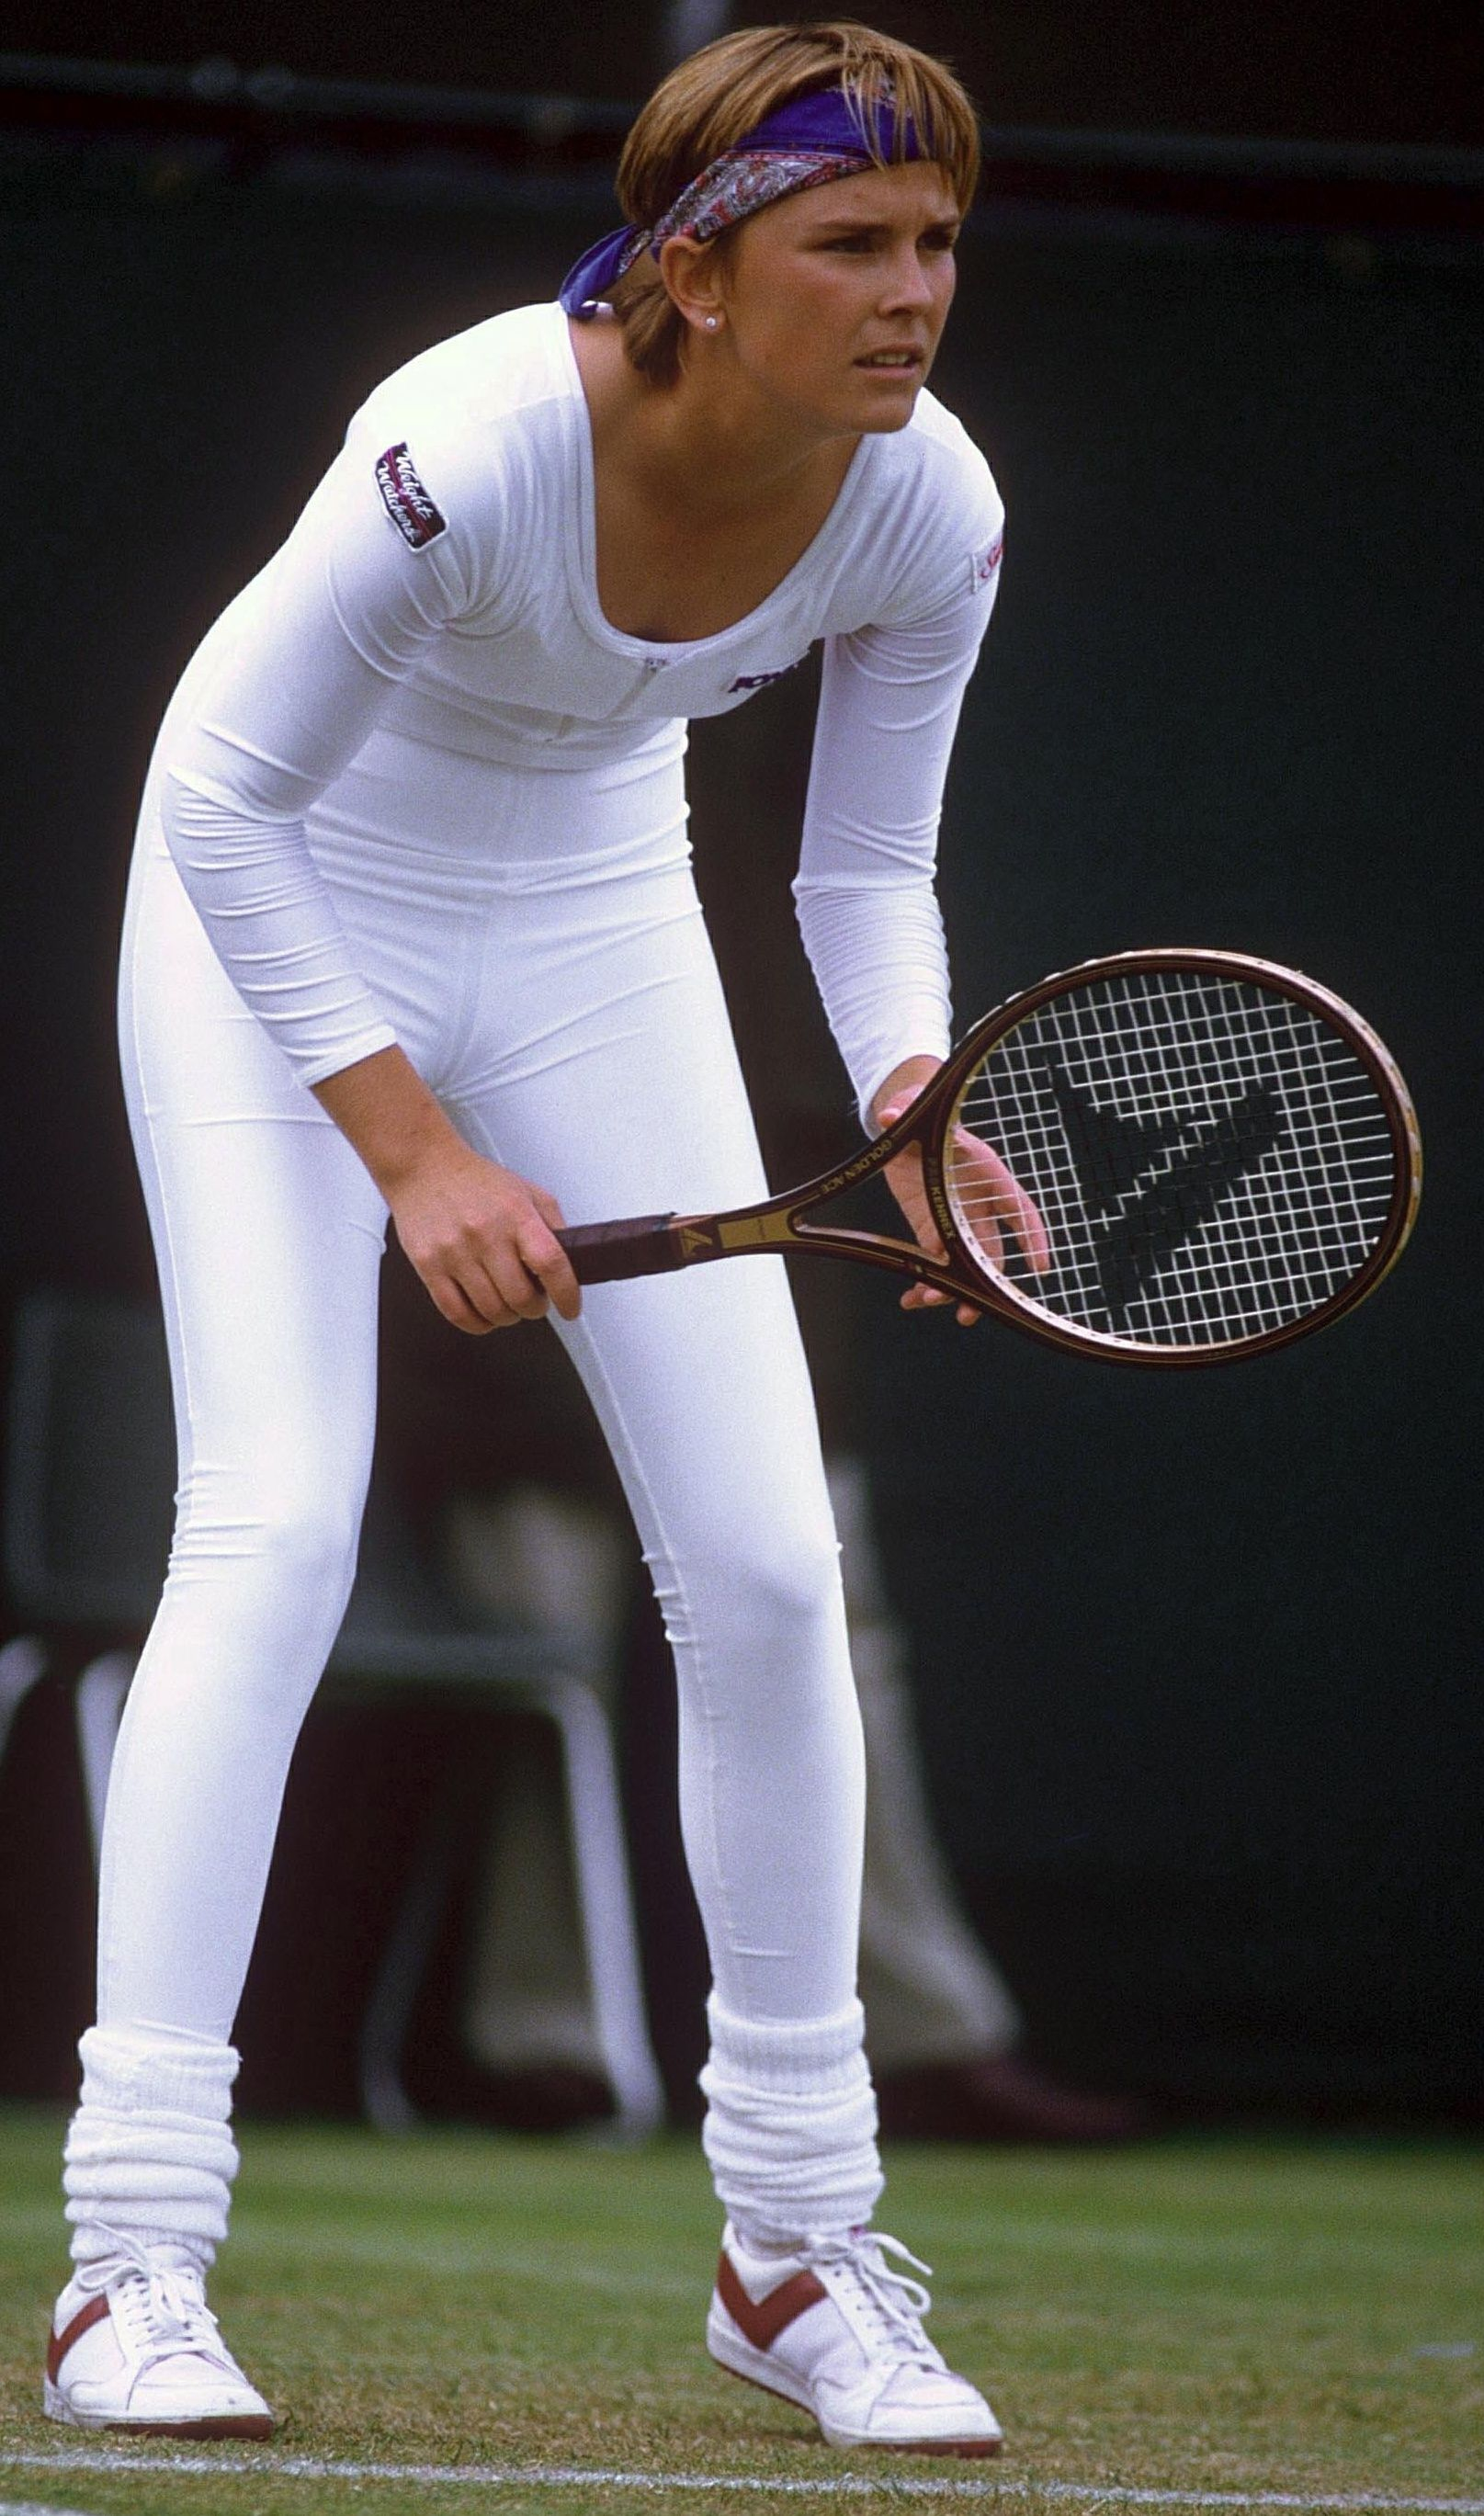 Wimbledon S Top 10 Controversial Fashion Moments In 2020 Tennis Fashion Anna Kournikova Fashion